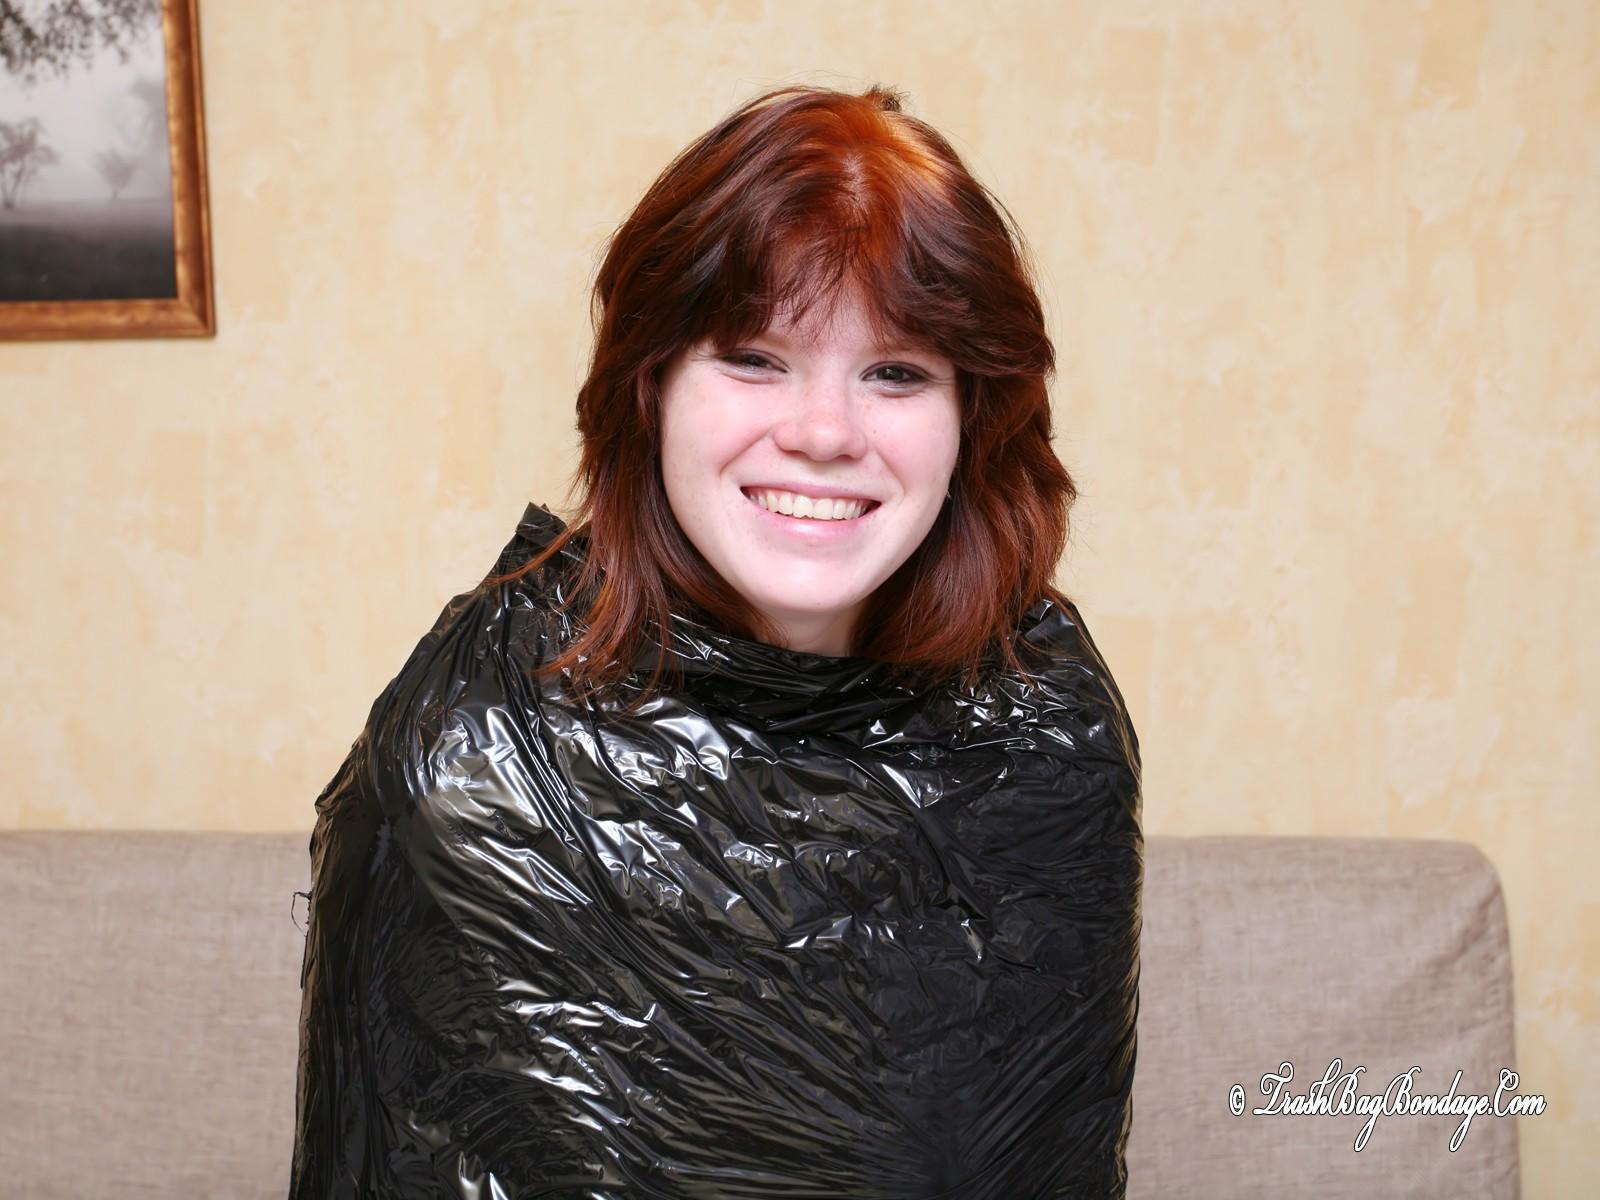 Girl in cling film wrap 10